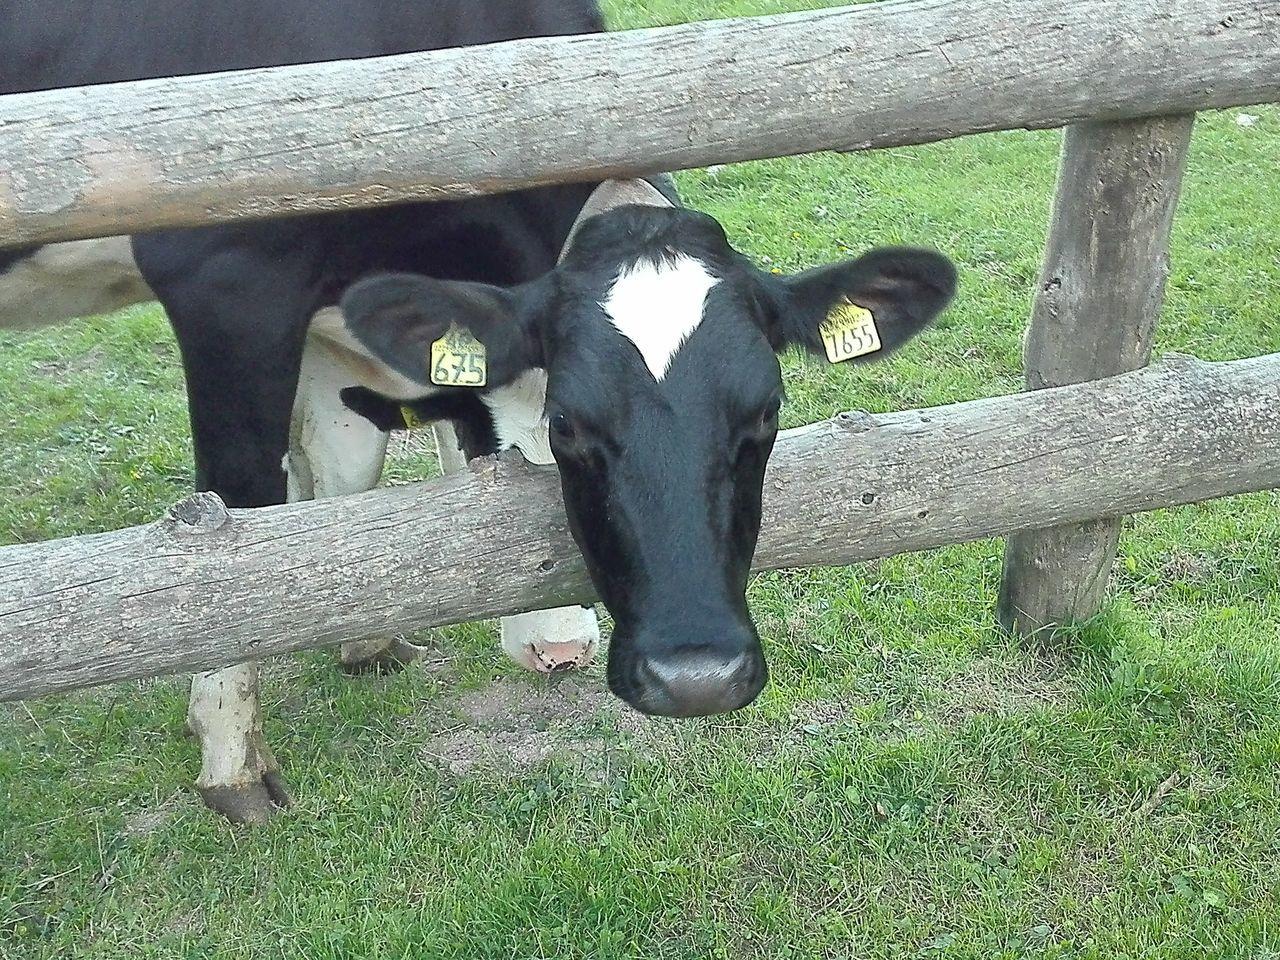 Malga grassi Trentino  Trentino Alto Adige Mucca Cows Nature Narure_collection Naturelovers Cowntry Nature Photography Milk Trees Animals Landscape_Collection